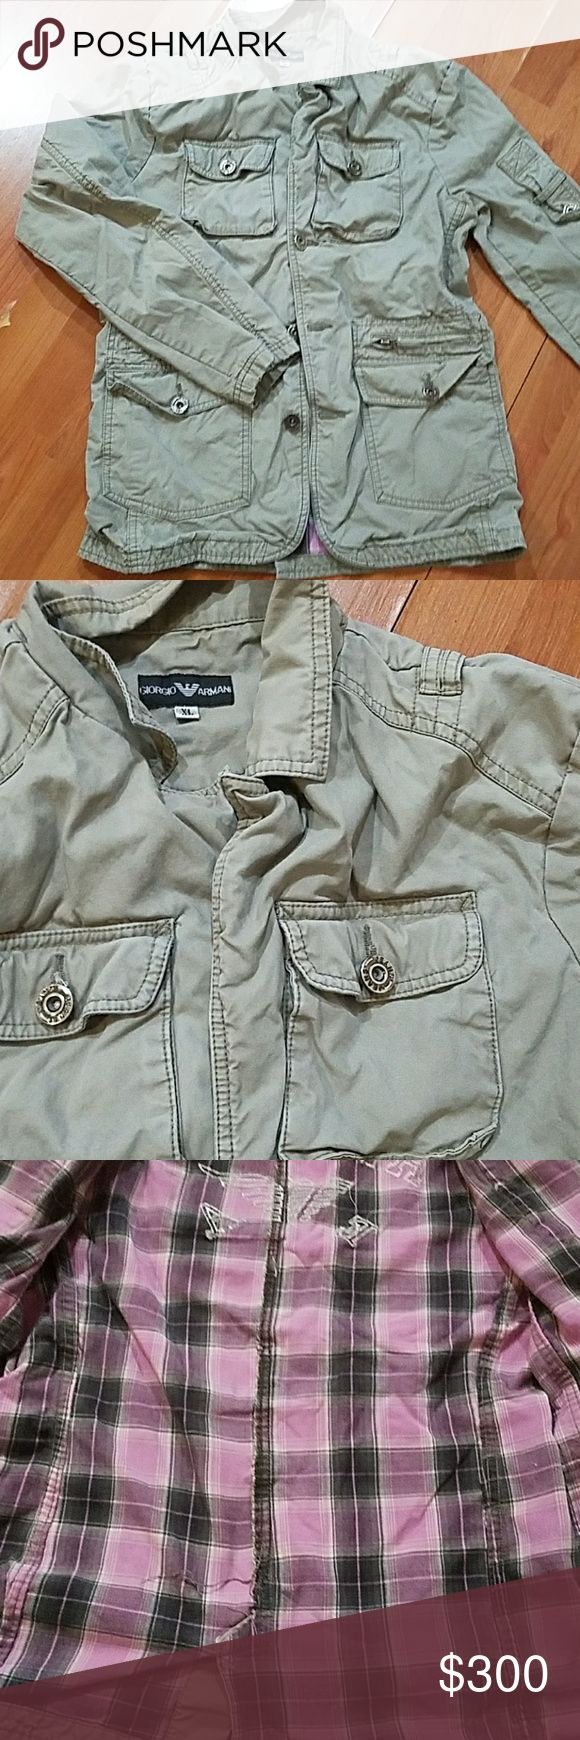 Giorgio Armani Military Jacket Heavy Jacket, no visible stains, See Pictures Giorgio Armani Jackets & Coats Military & Field